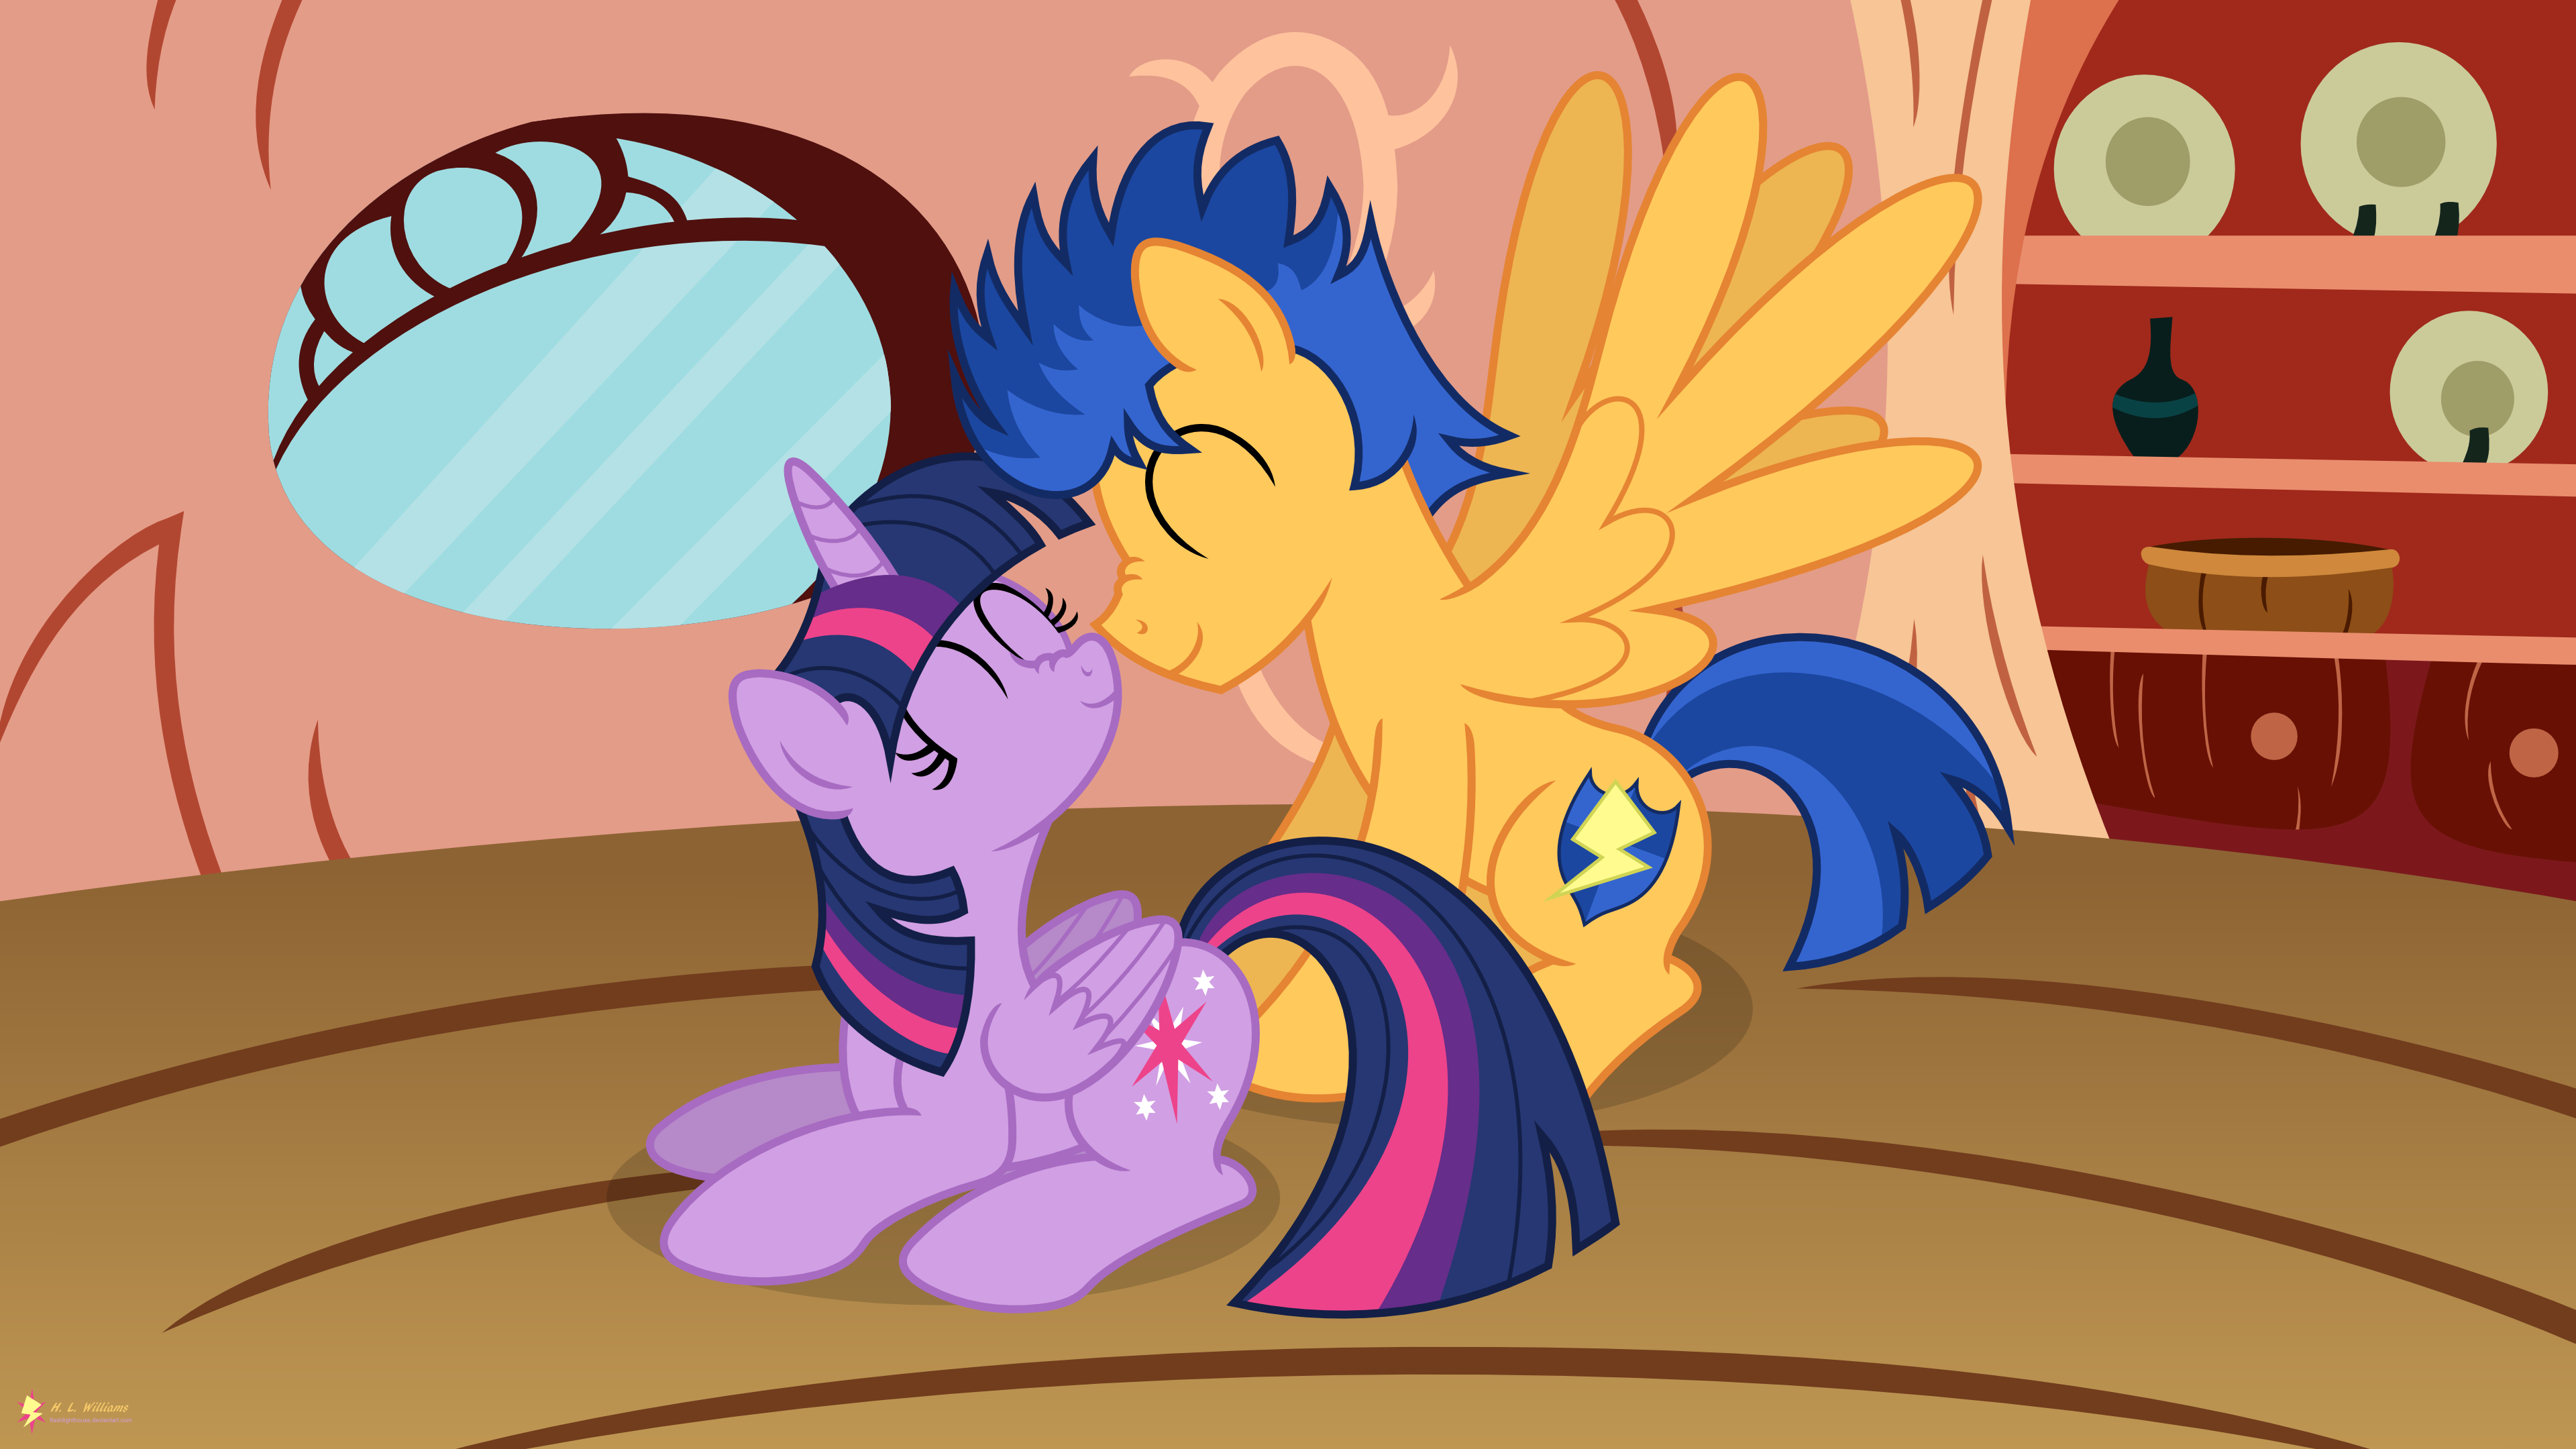 My little pony princess twilight sparkle and flash sentry kiss - photo#46